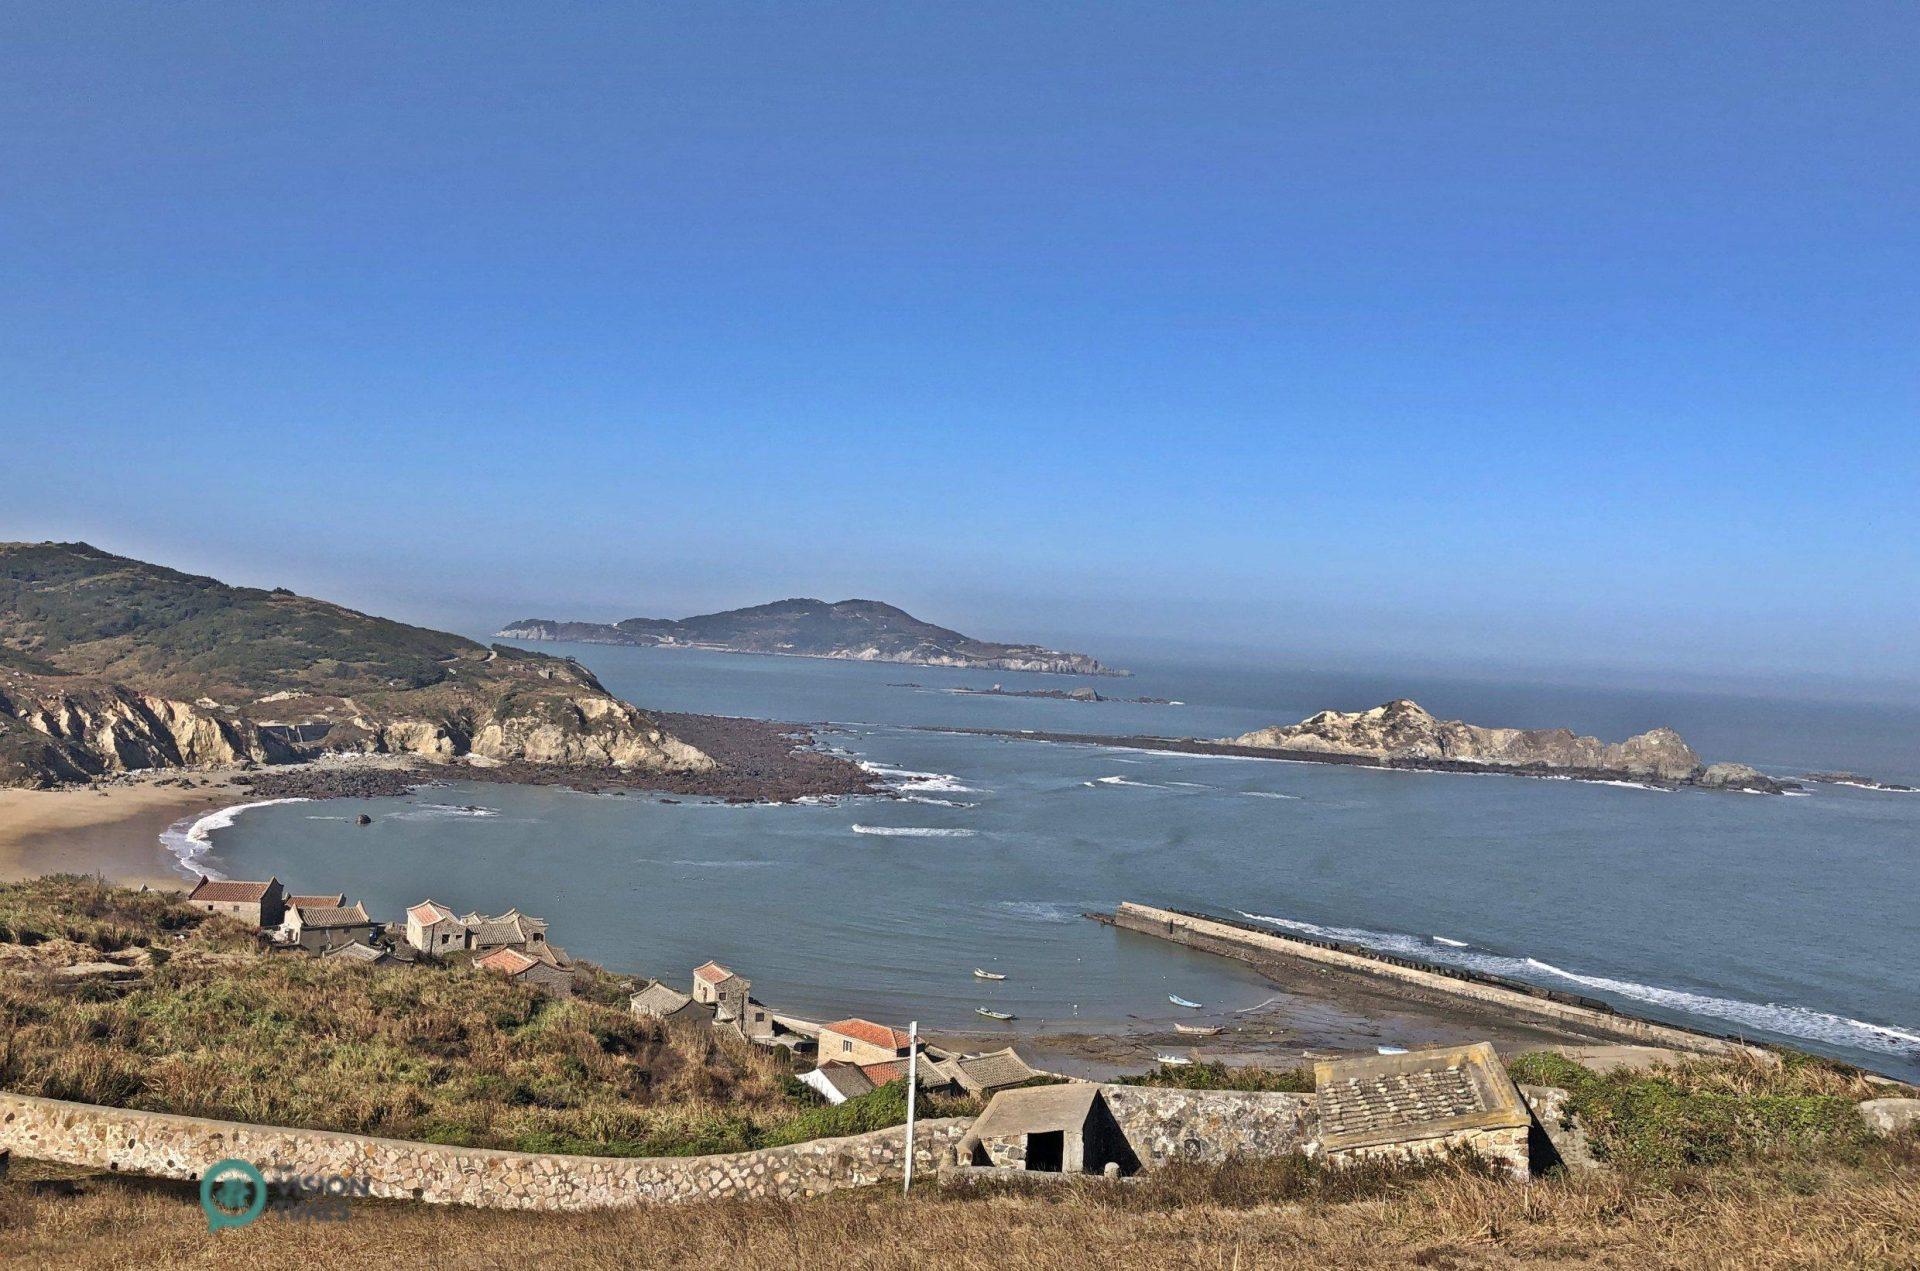 A fishing village in Matsu's Dongju Island. (Image: Billy Shyu / Vision Times)